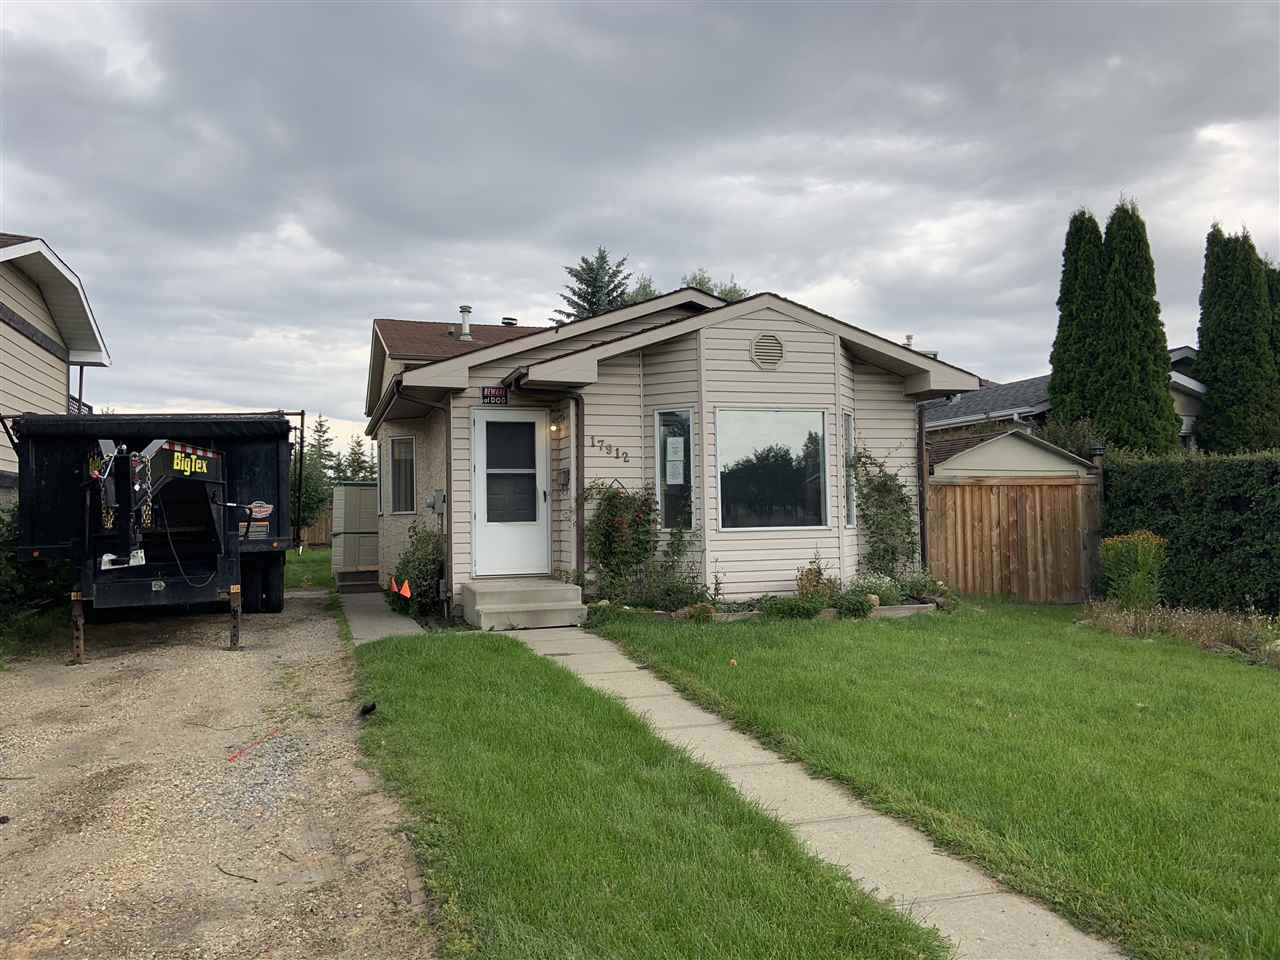 Main Photo: 17912 78 Avenue in Edmonton: Zone 20 House for sale : MLS®# E4173200